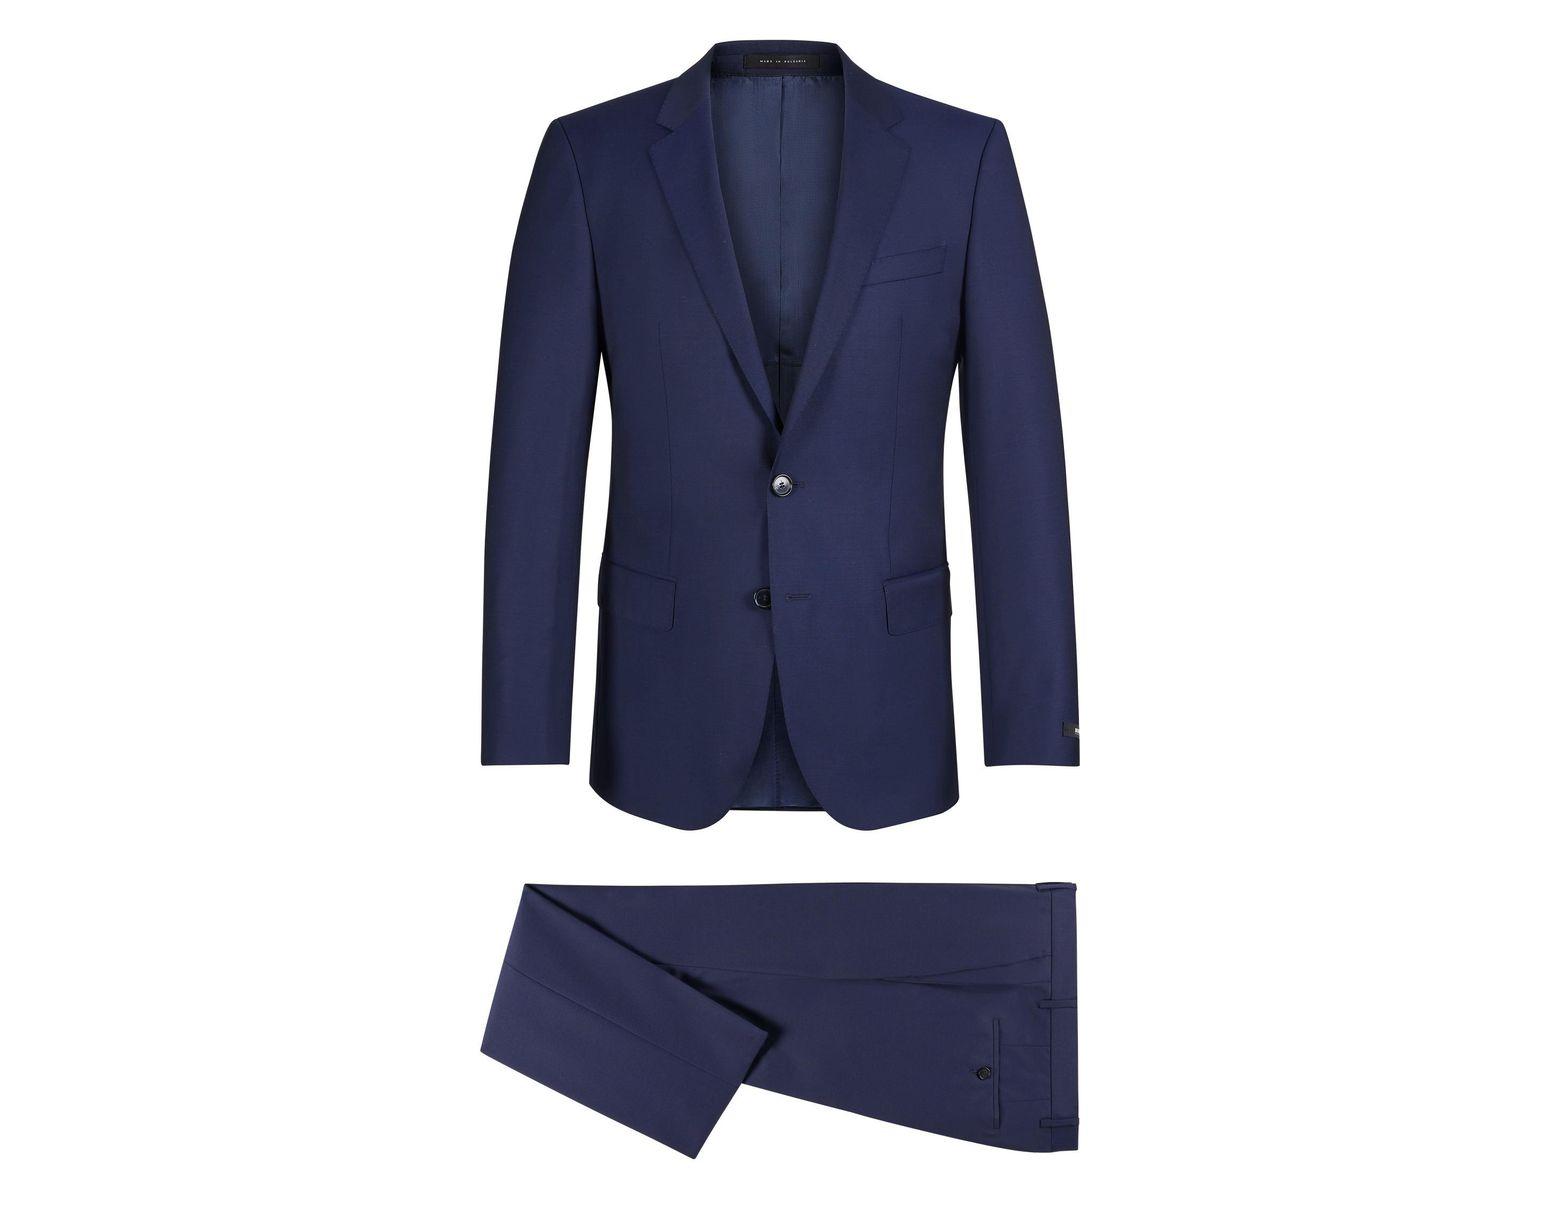 4640967c1 BOSS Italian Super 110 Virgin Wool Suit, Slim Fit | Huge/genius in Blue for  Men - Lyst